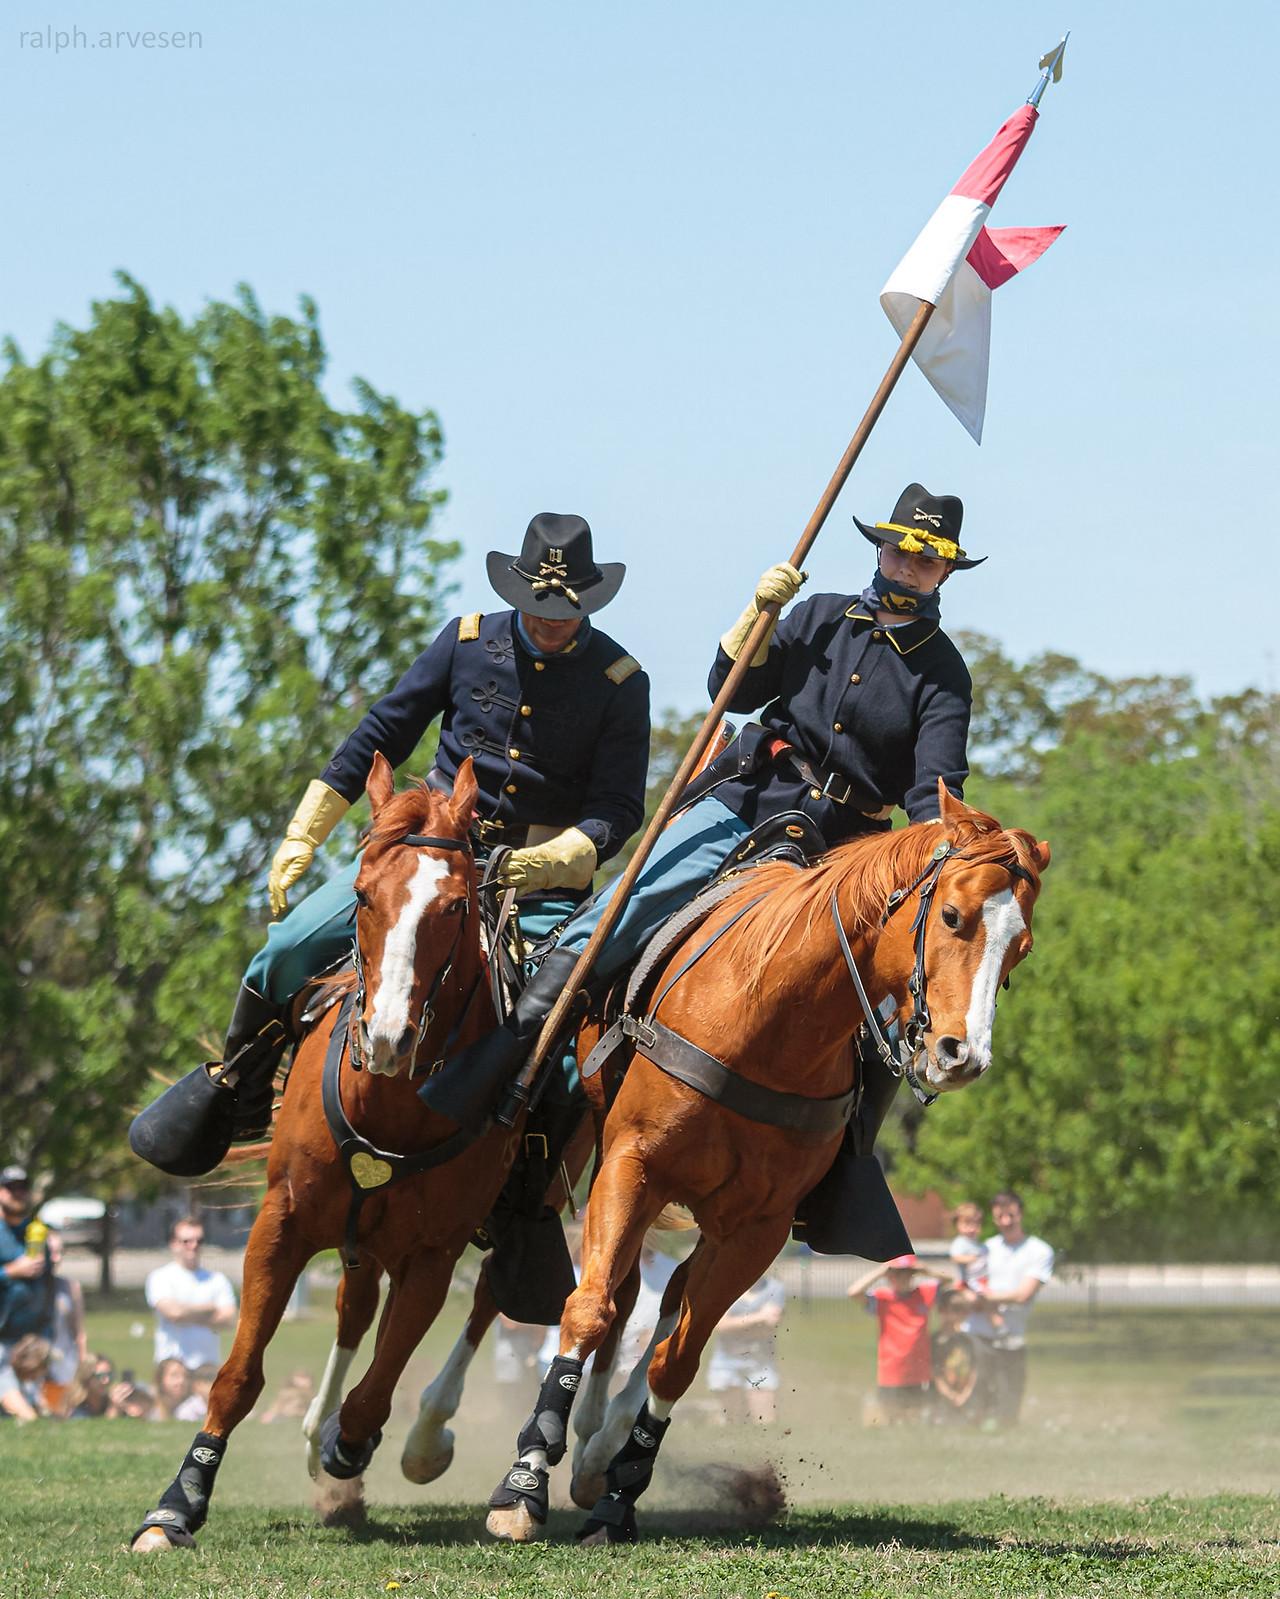 1st Cavalry Division Horse Cavalry Detachment   Texas Review   Ralph Arvesen